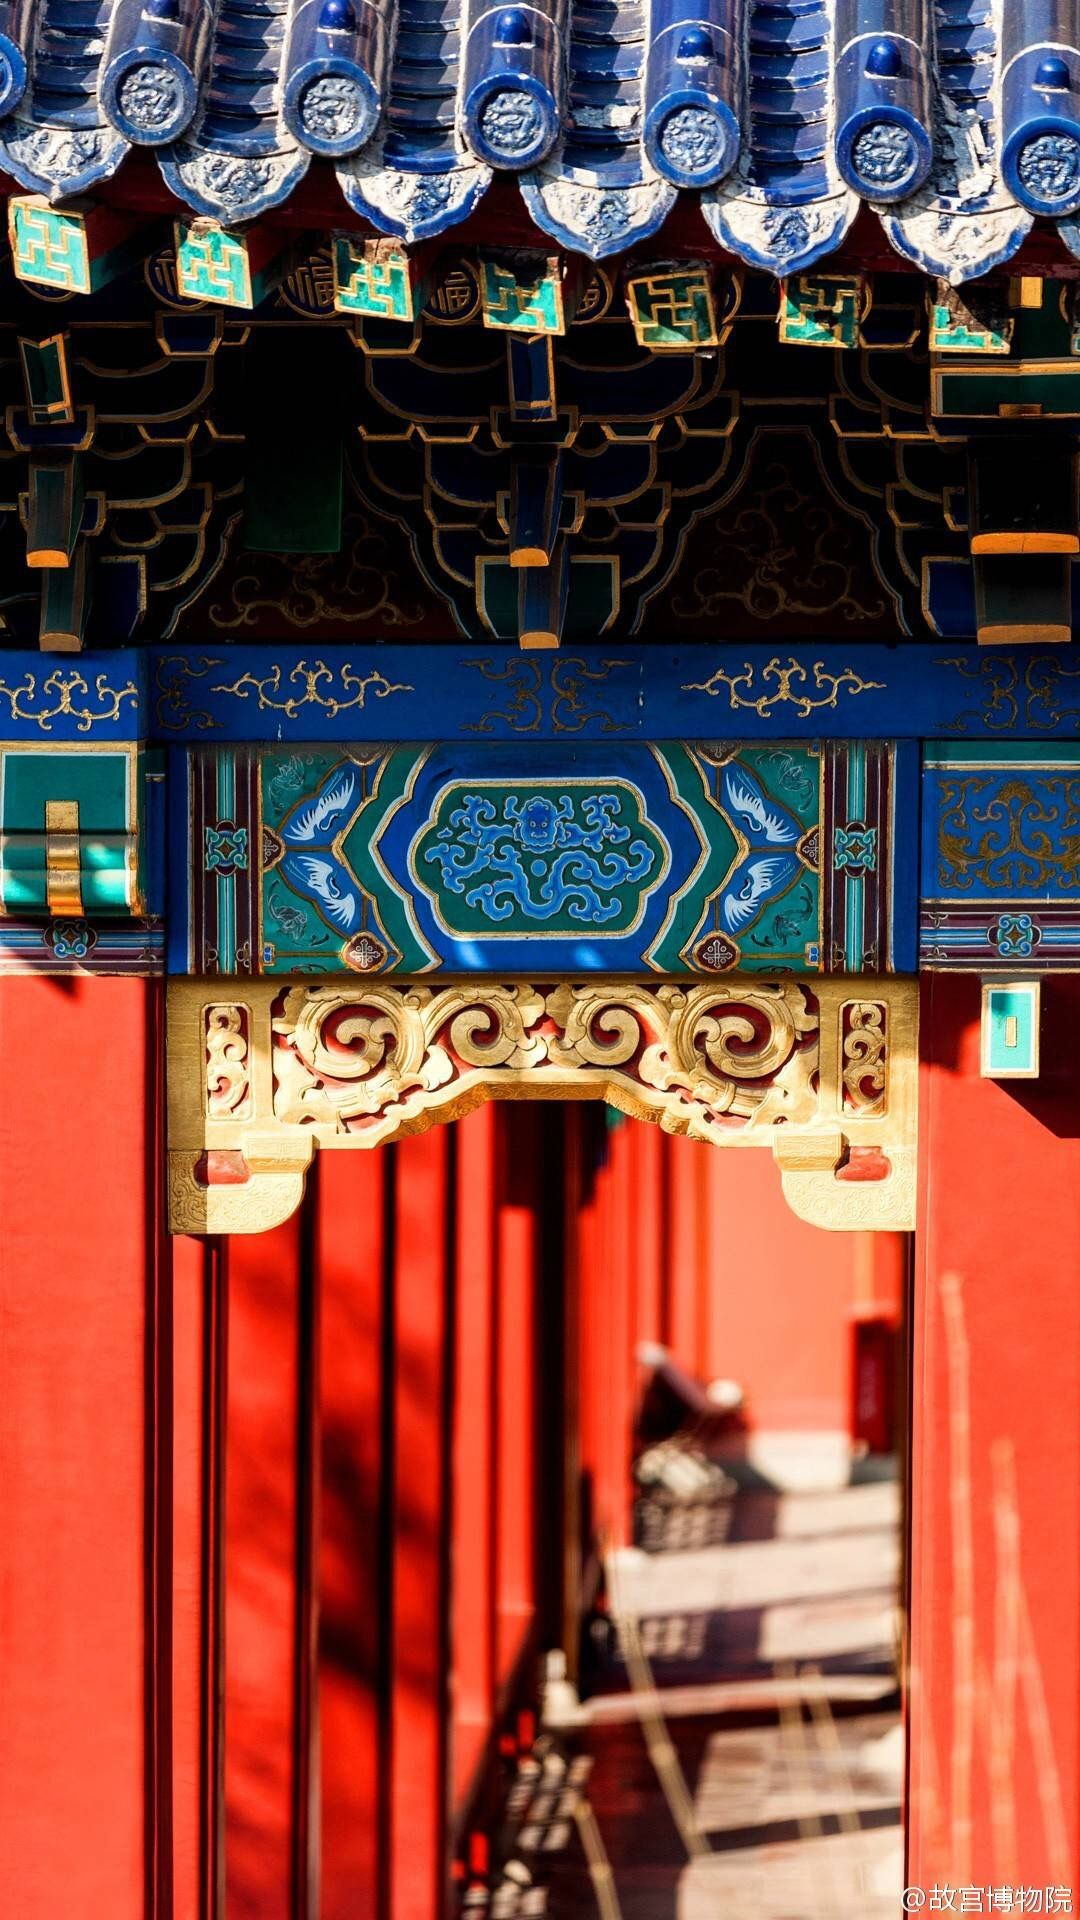 View image by Reynard Qi China architecture, Chinese